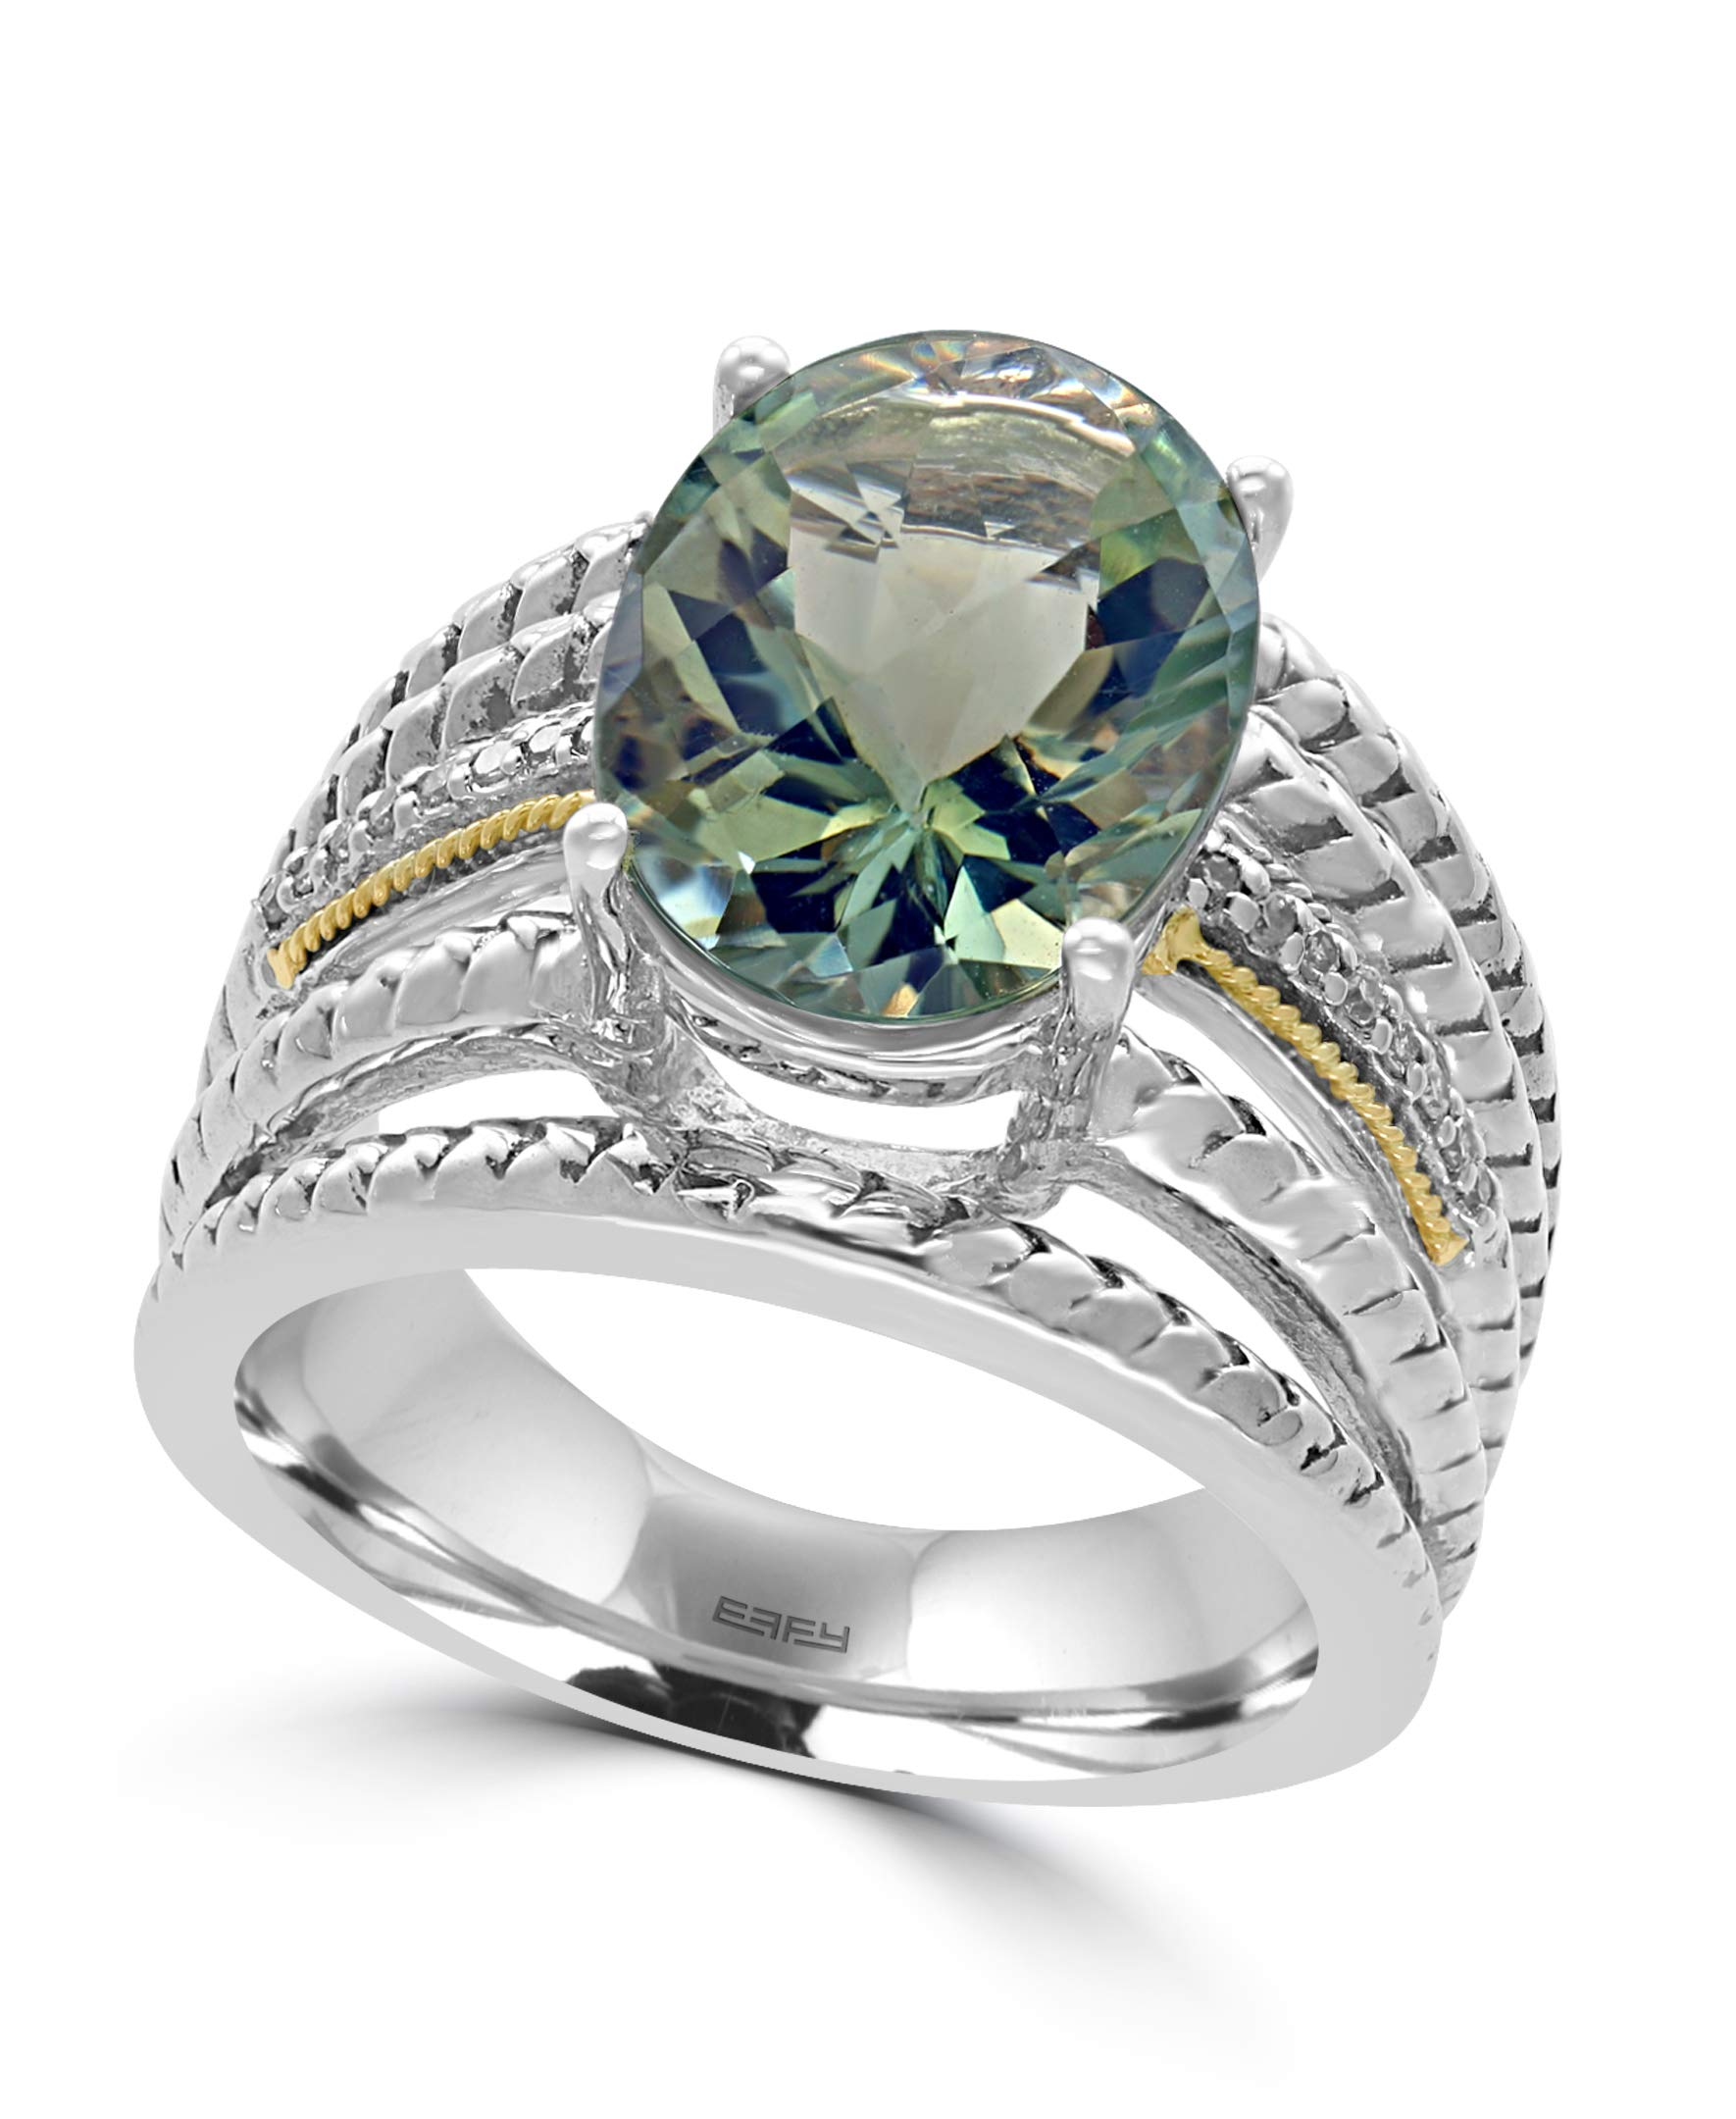 EFFY 925 STERLING SILVER/18K YELLOW GOLD DIAMOND,GREEN AMETHYST RING by EFFY